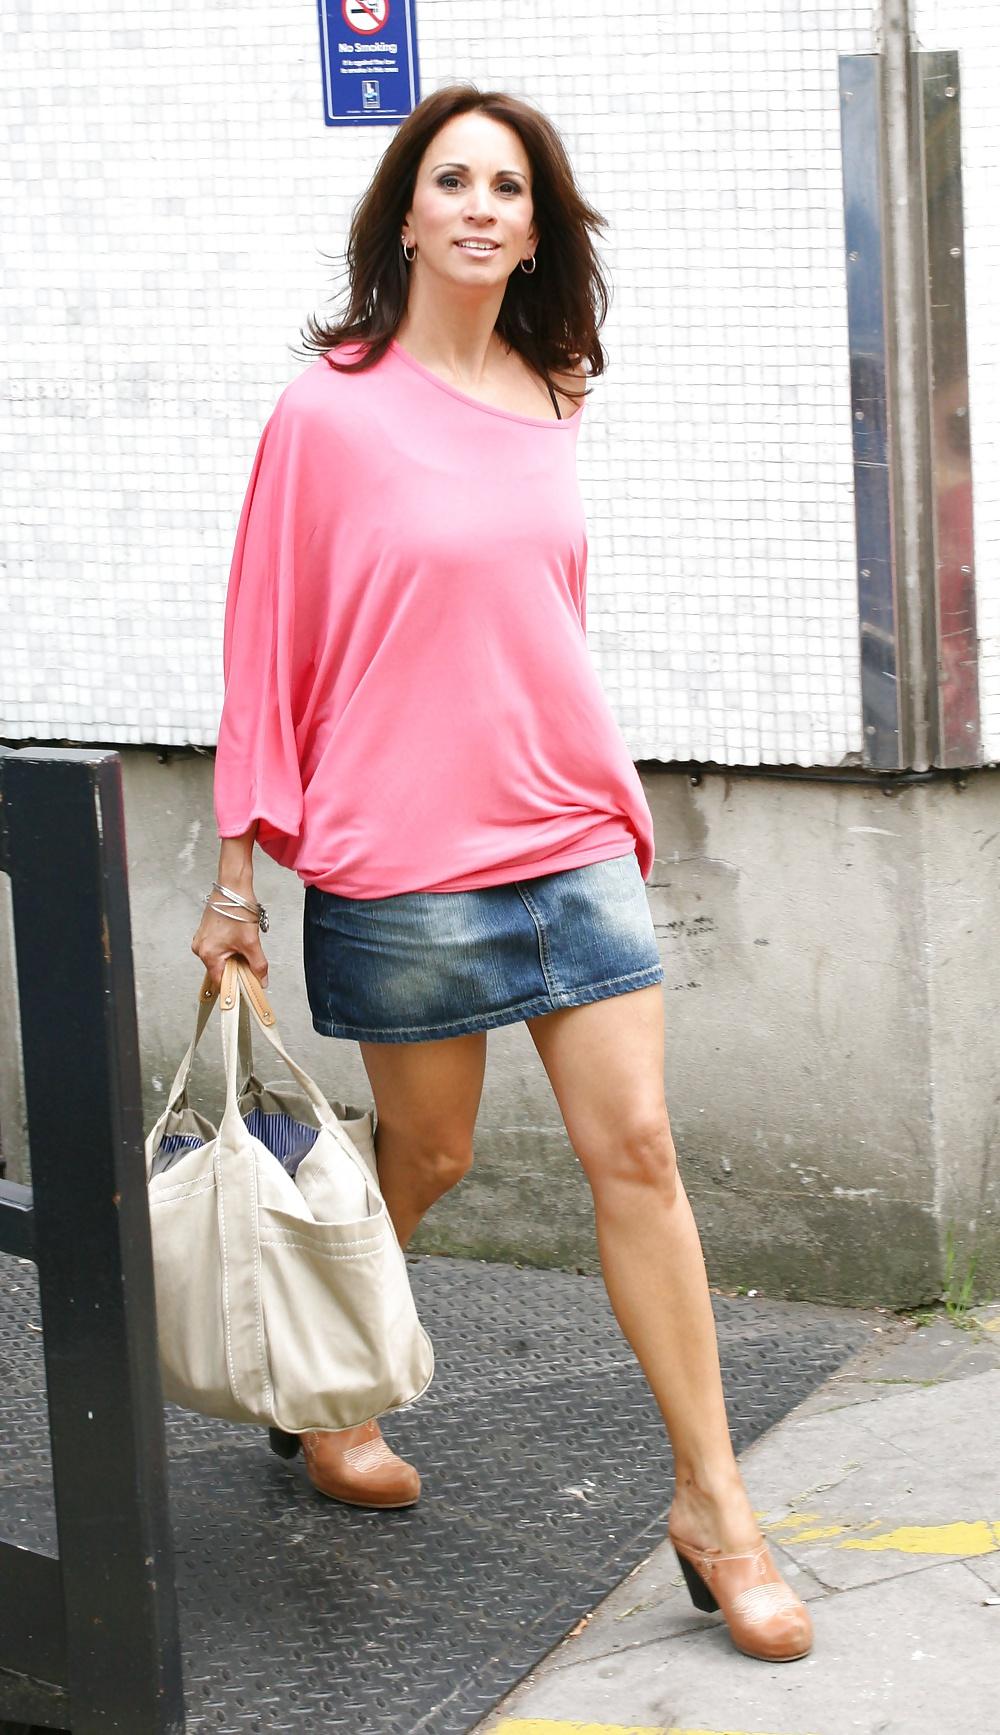 andrea-mclean-mini-skirt